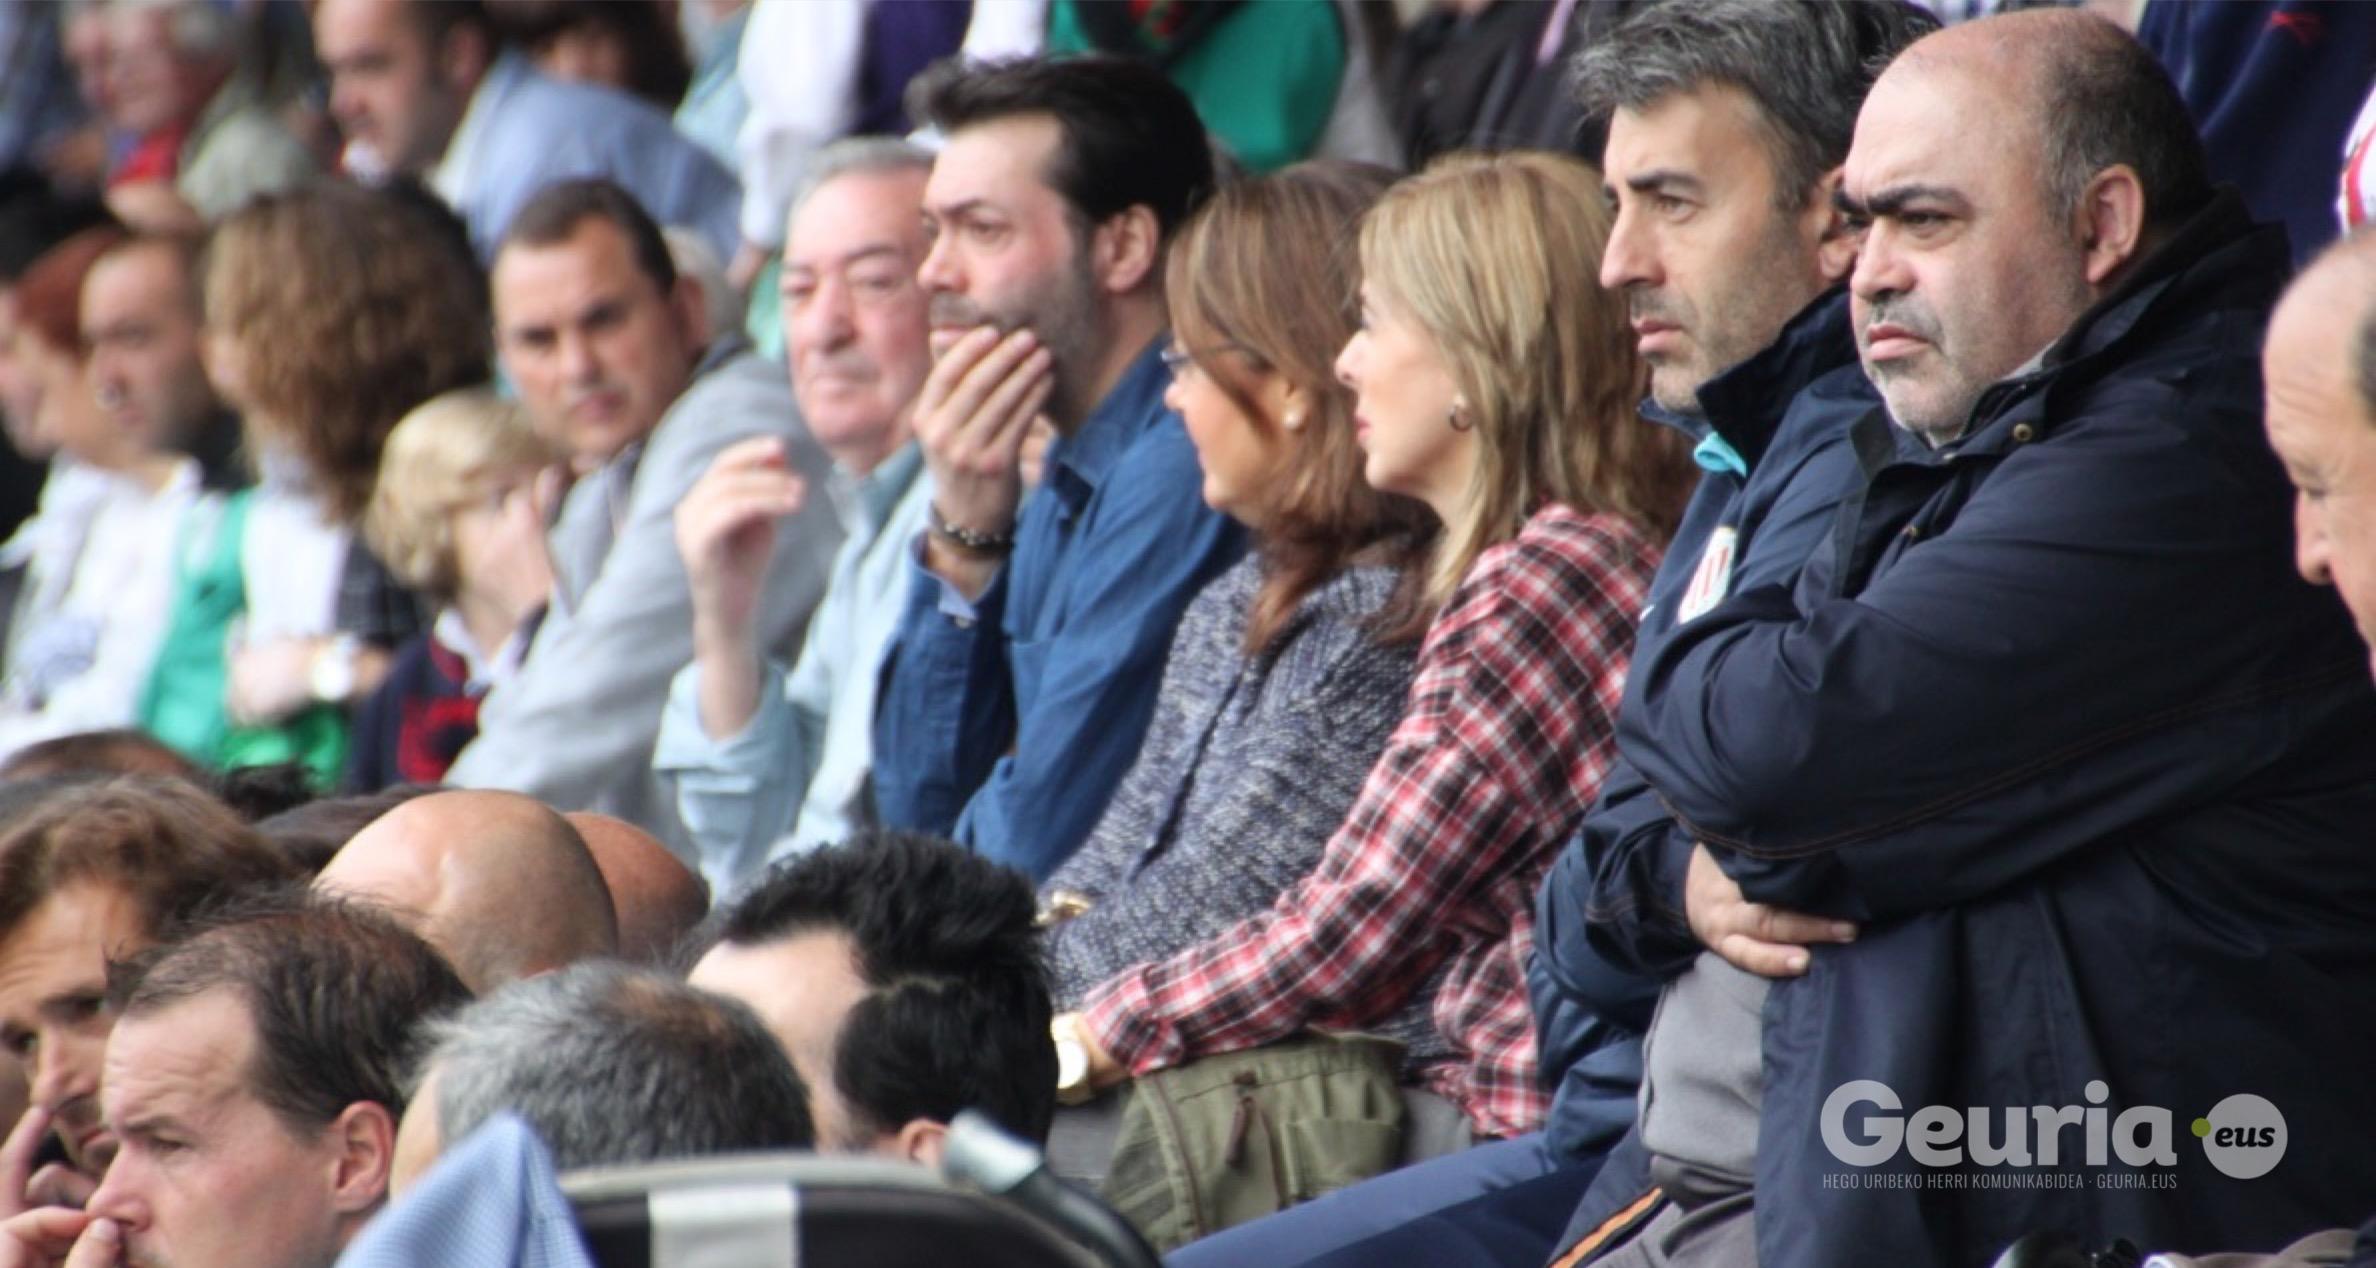 basauri_san_fausto_2015_futbol_basconia_beteranoak_12